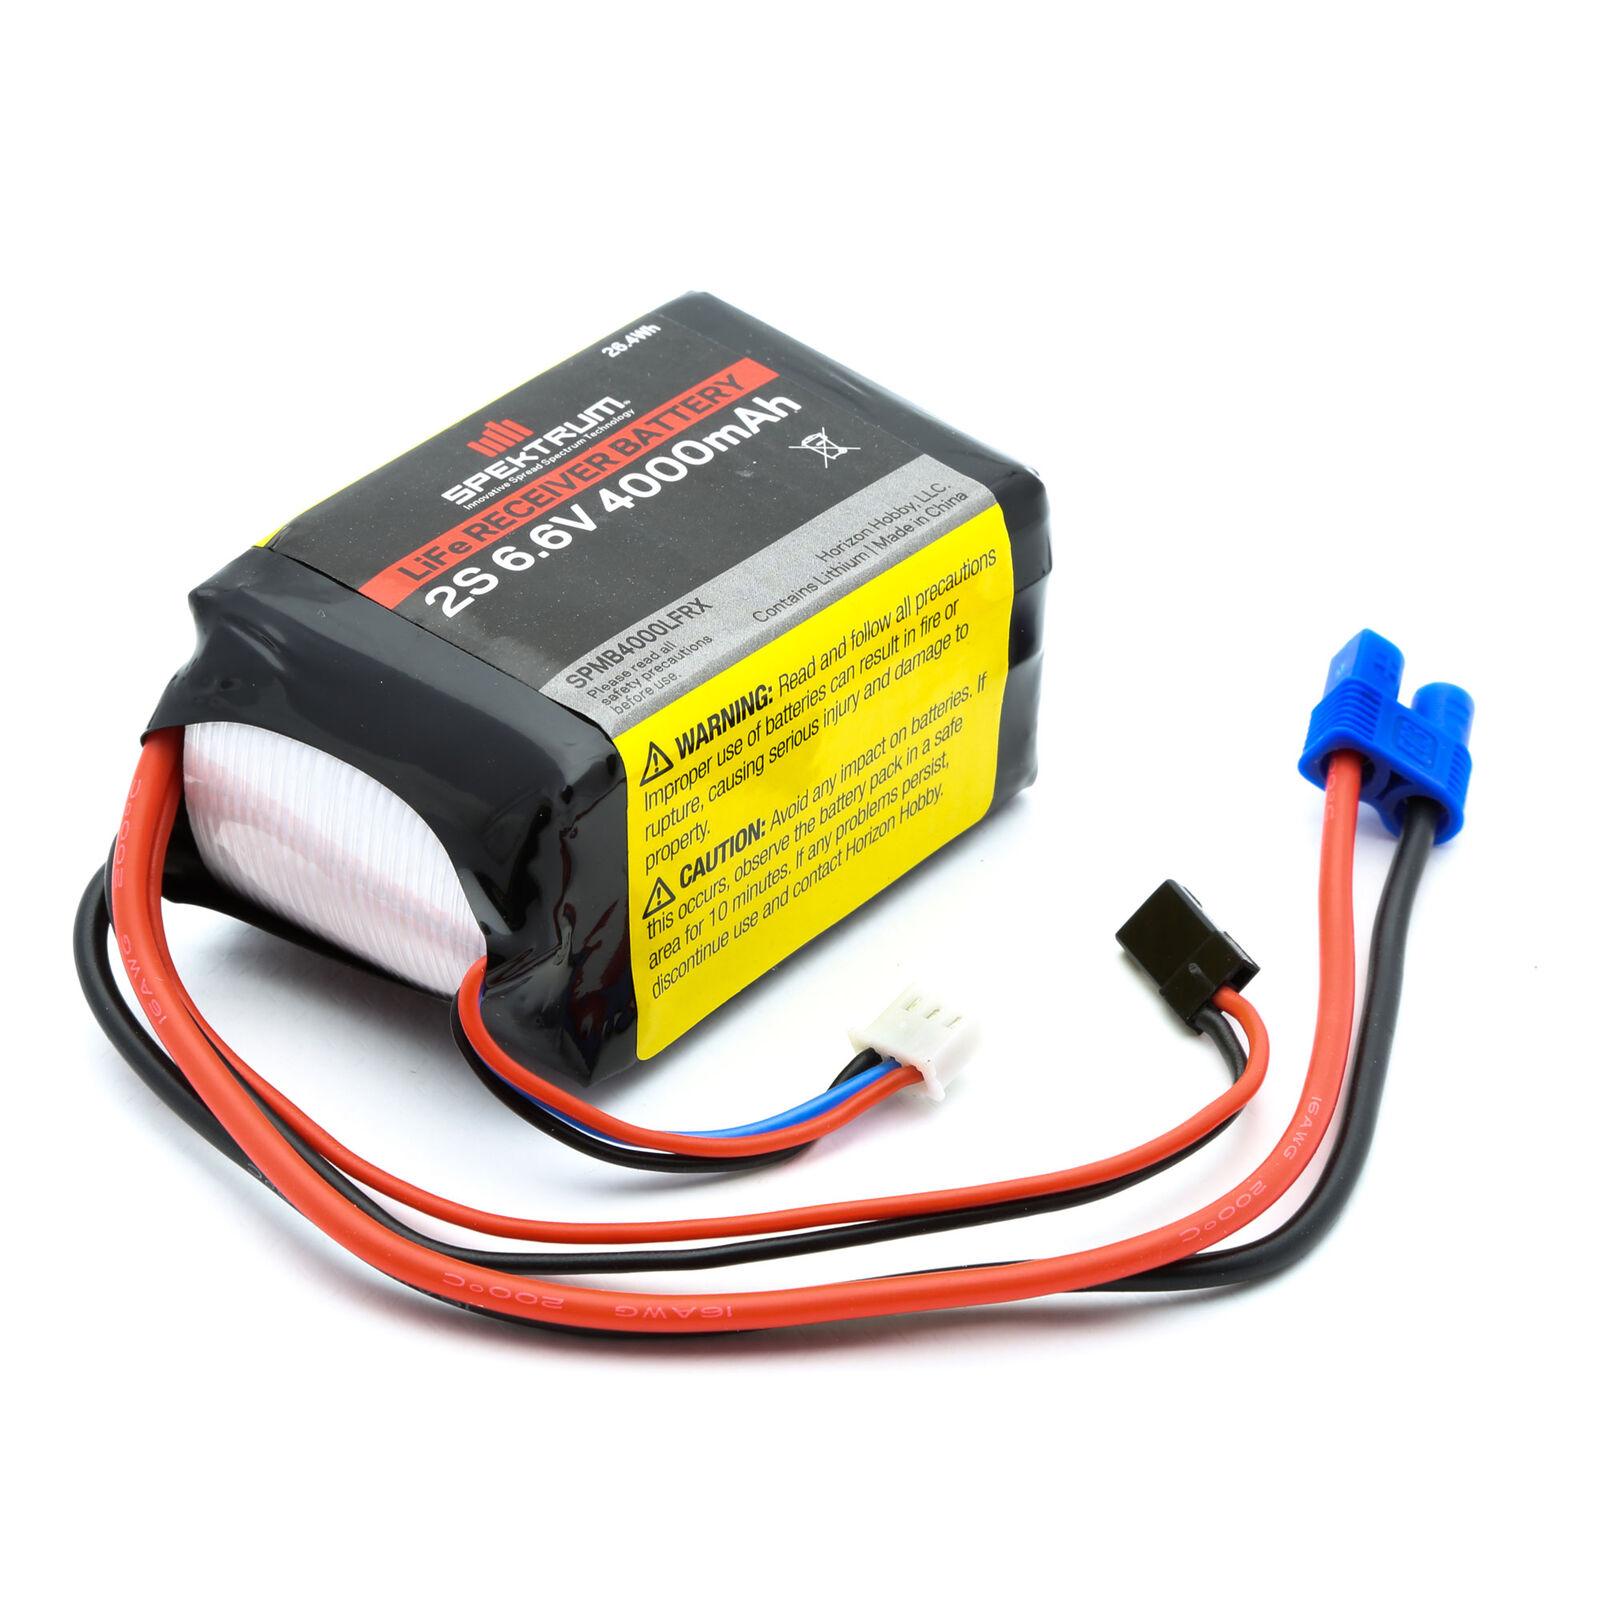 6.6V 4000mAh 2S LiFe Receiver Battery: Universal Receiver, EC3